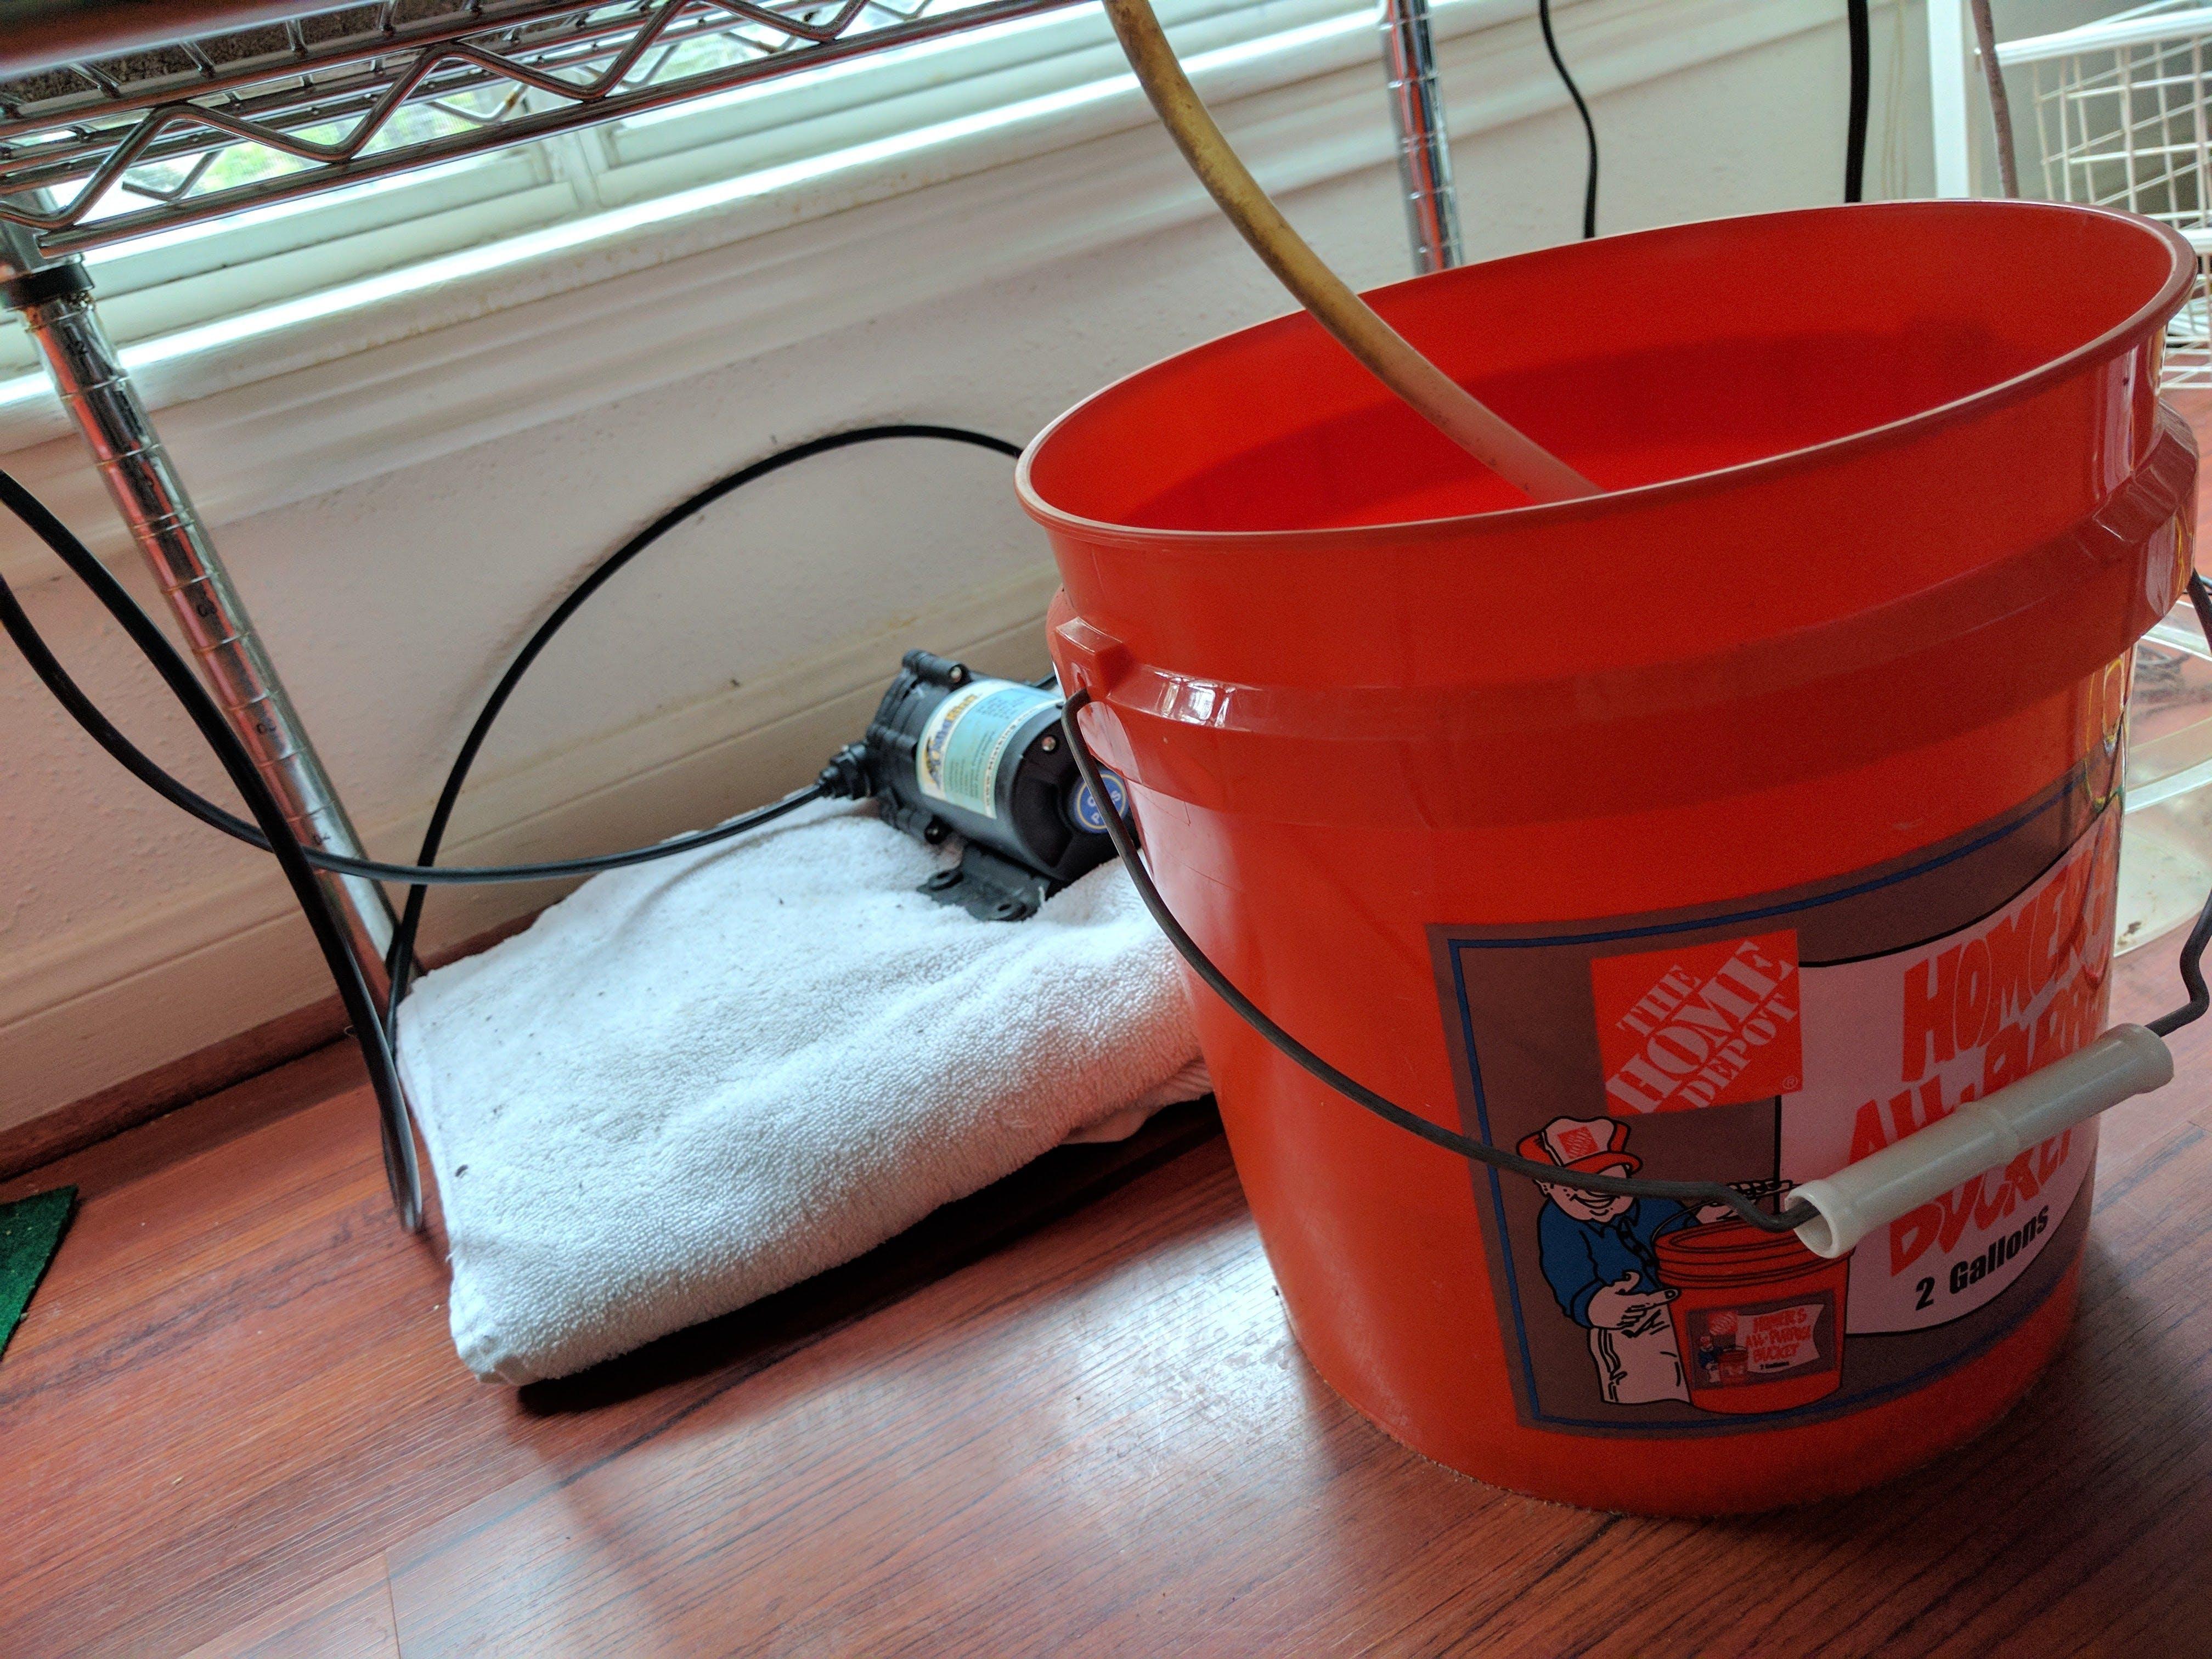 Drain bucket